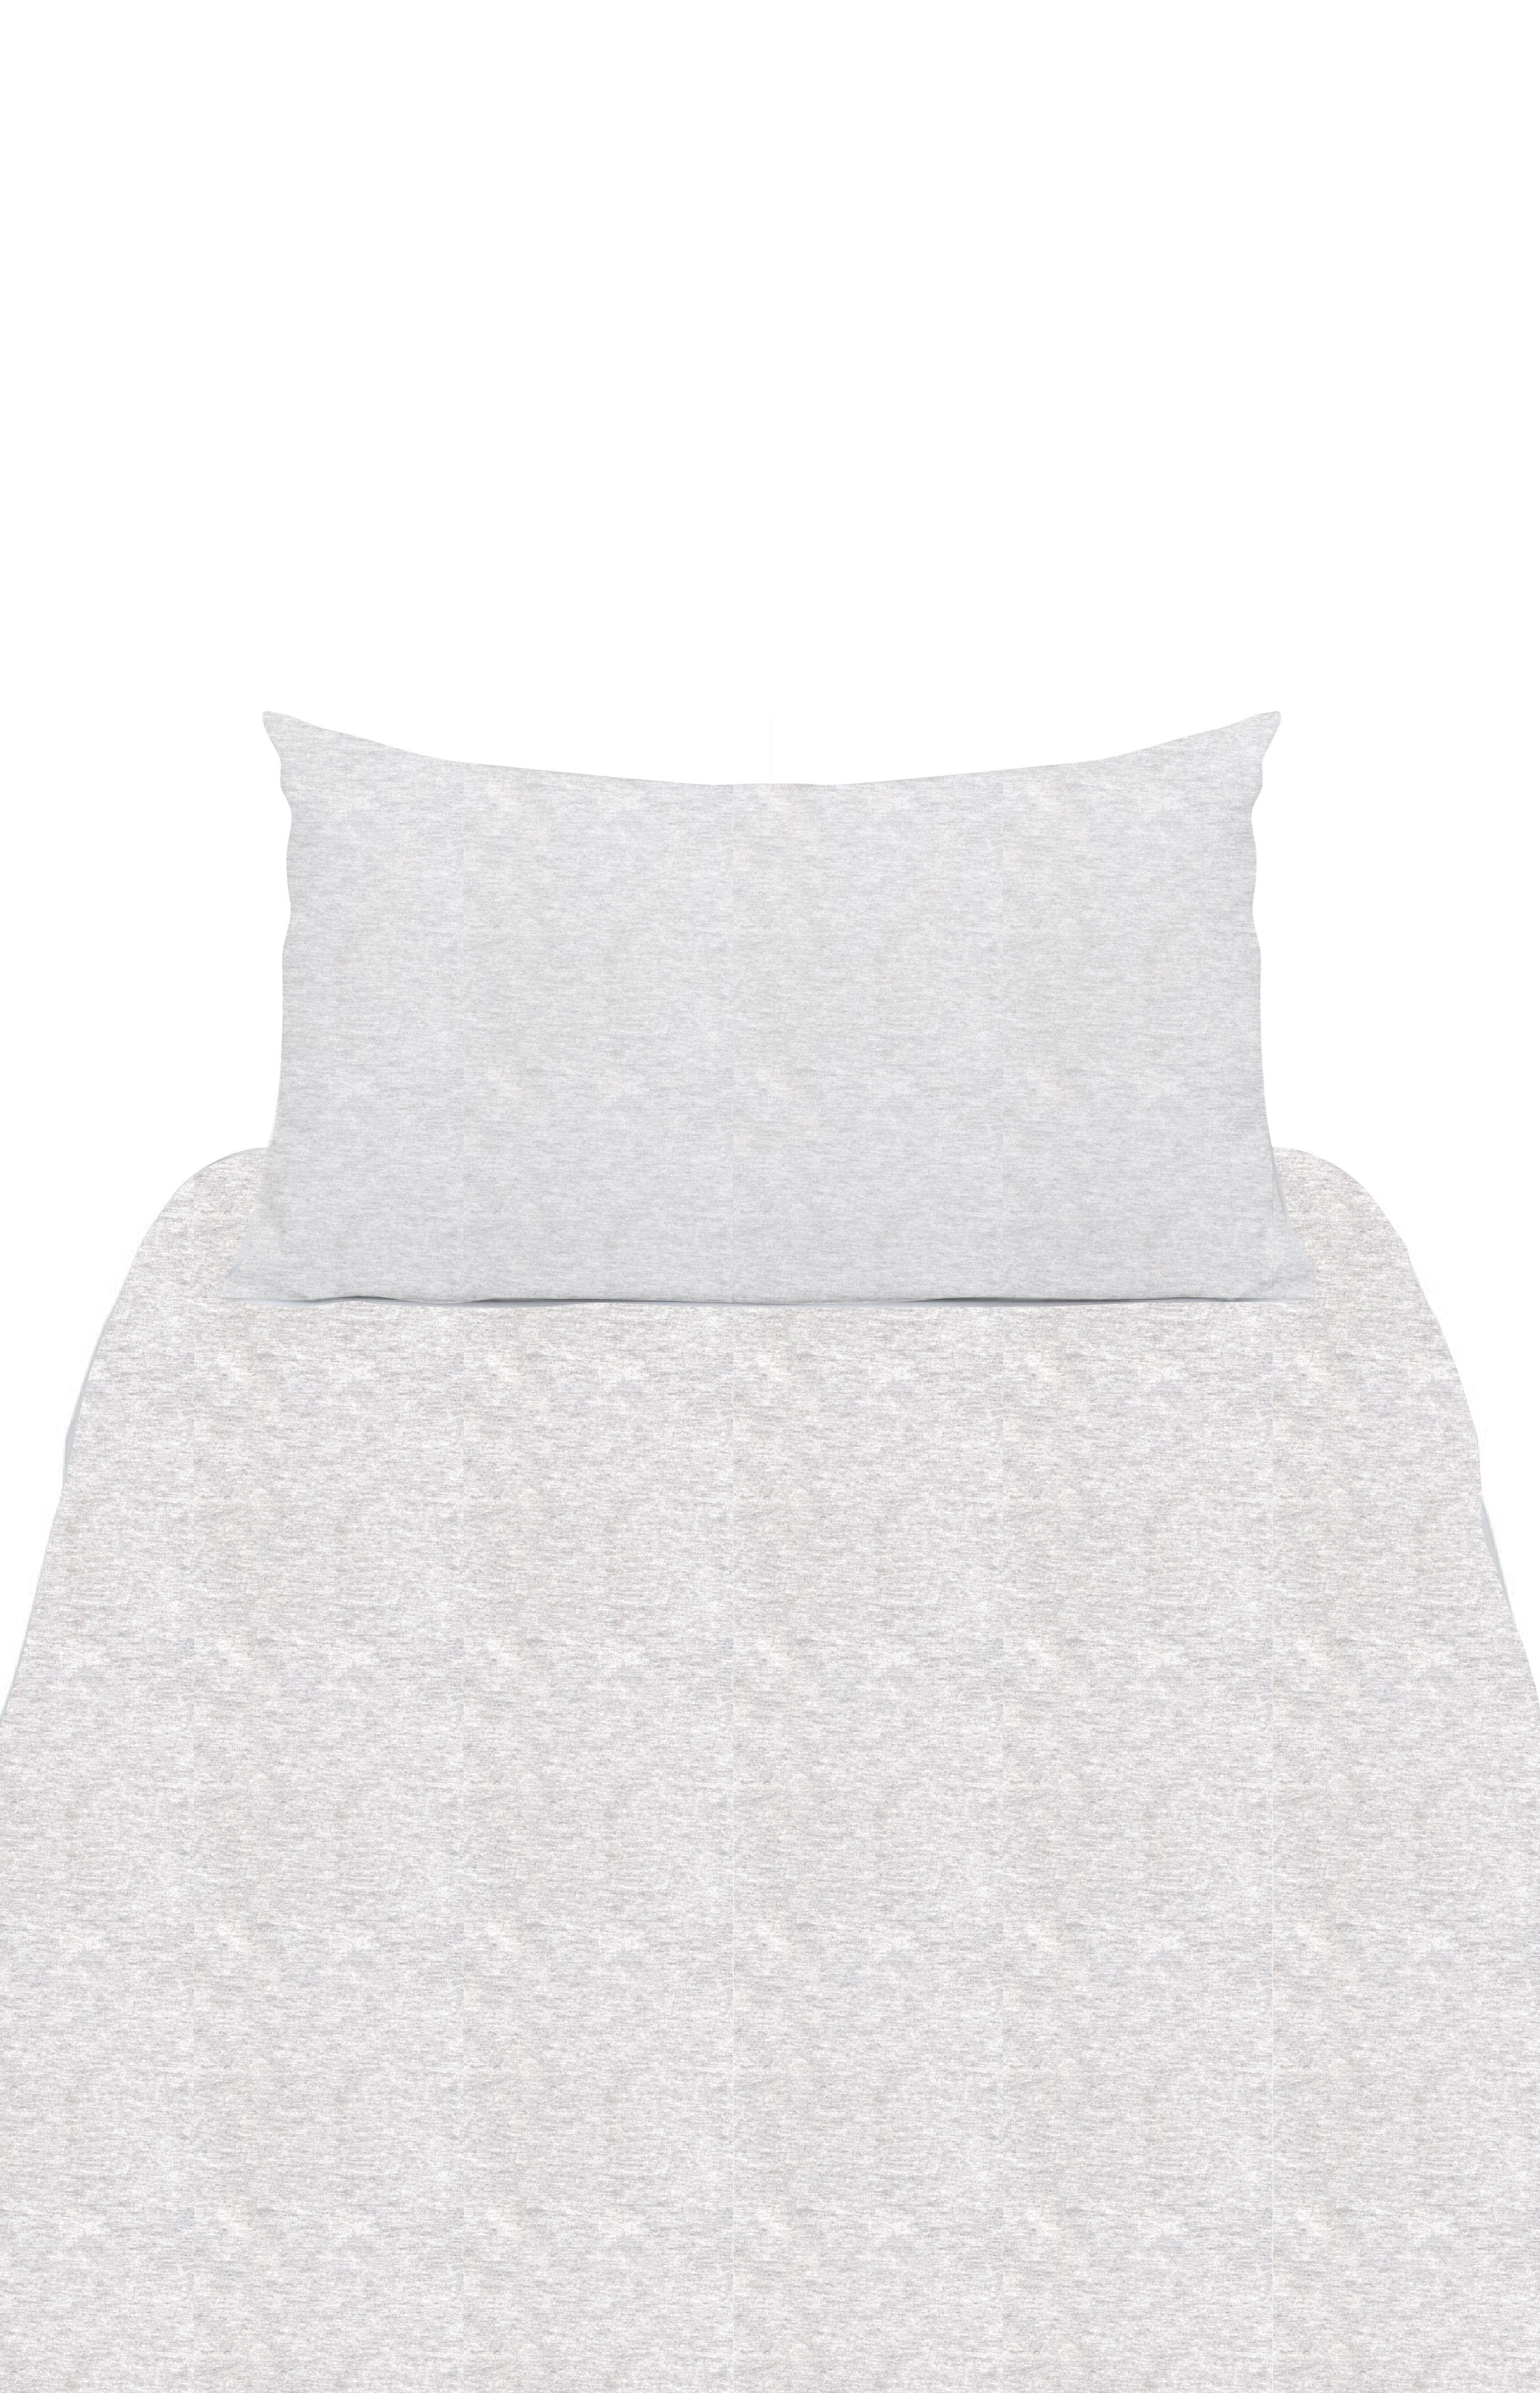 duvet nursery trumma ikea p crib vitaminer drums pillowcase cover set bedding